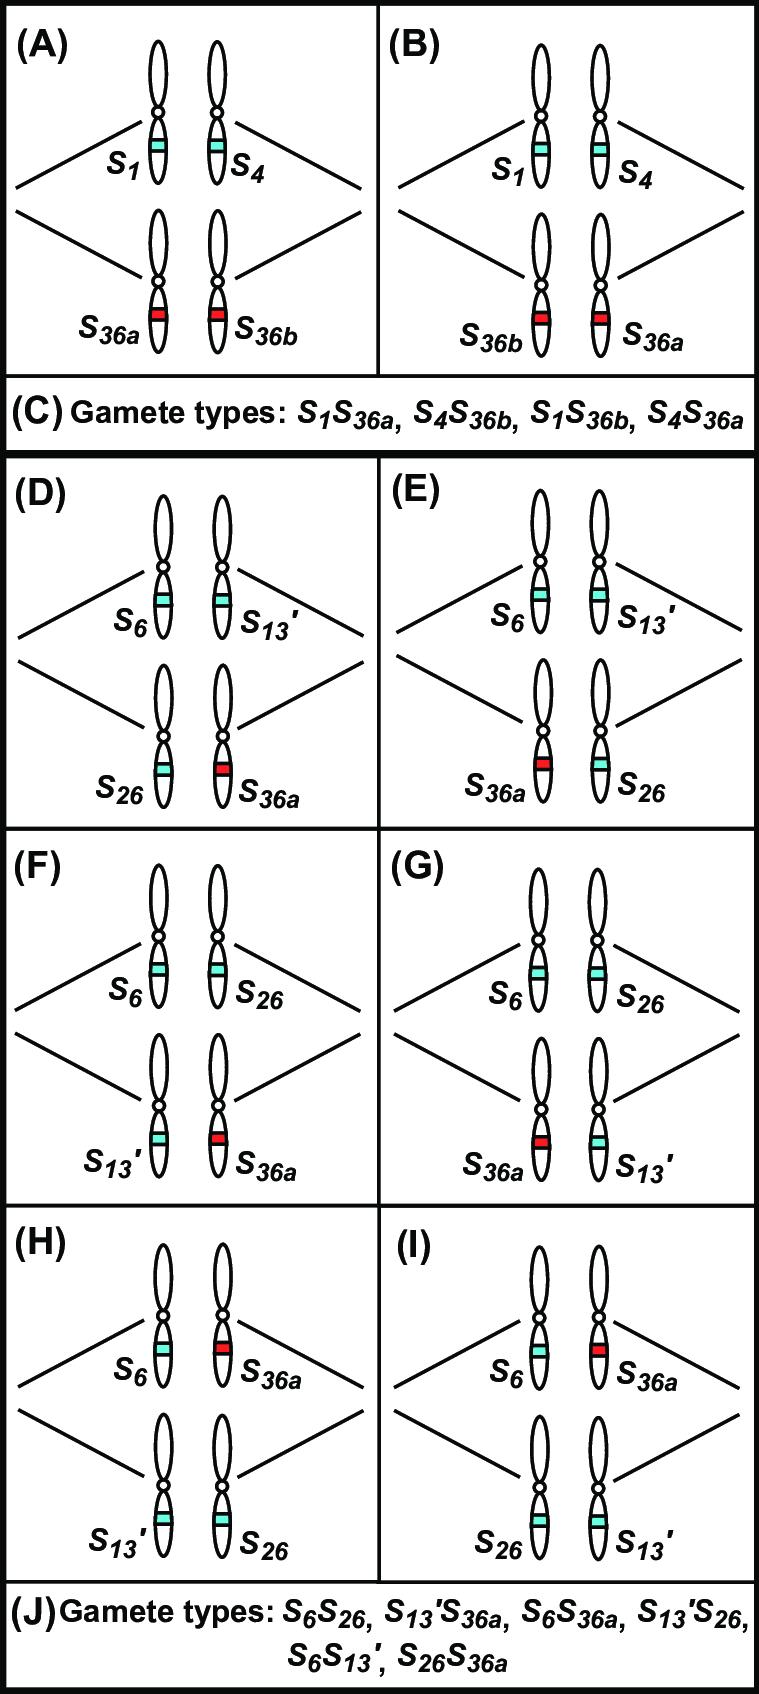 medium resolution of lg shs36 d wiring diagram detailed wiring diagram rh 7 17 3 gospelworkshop kirchzarten de whirlpool electric dryer wiring diagram lg dryer wiring diagram